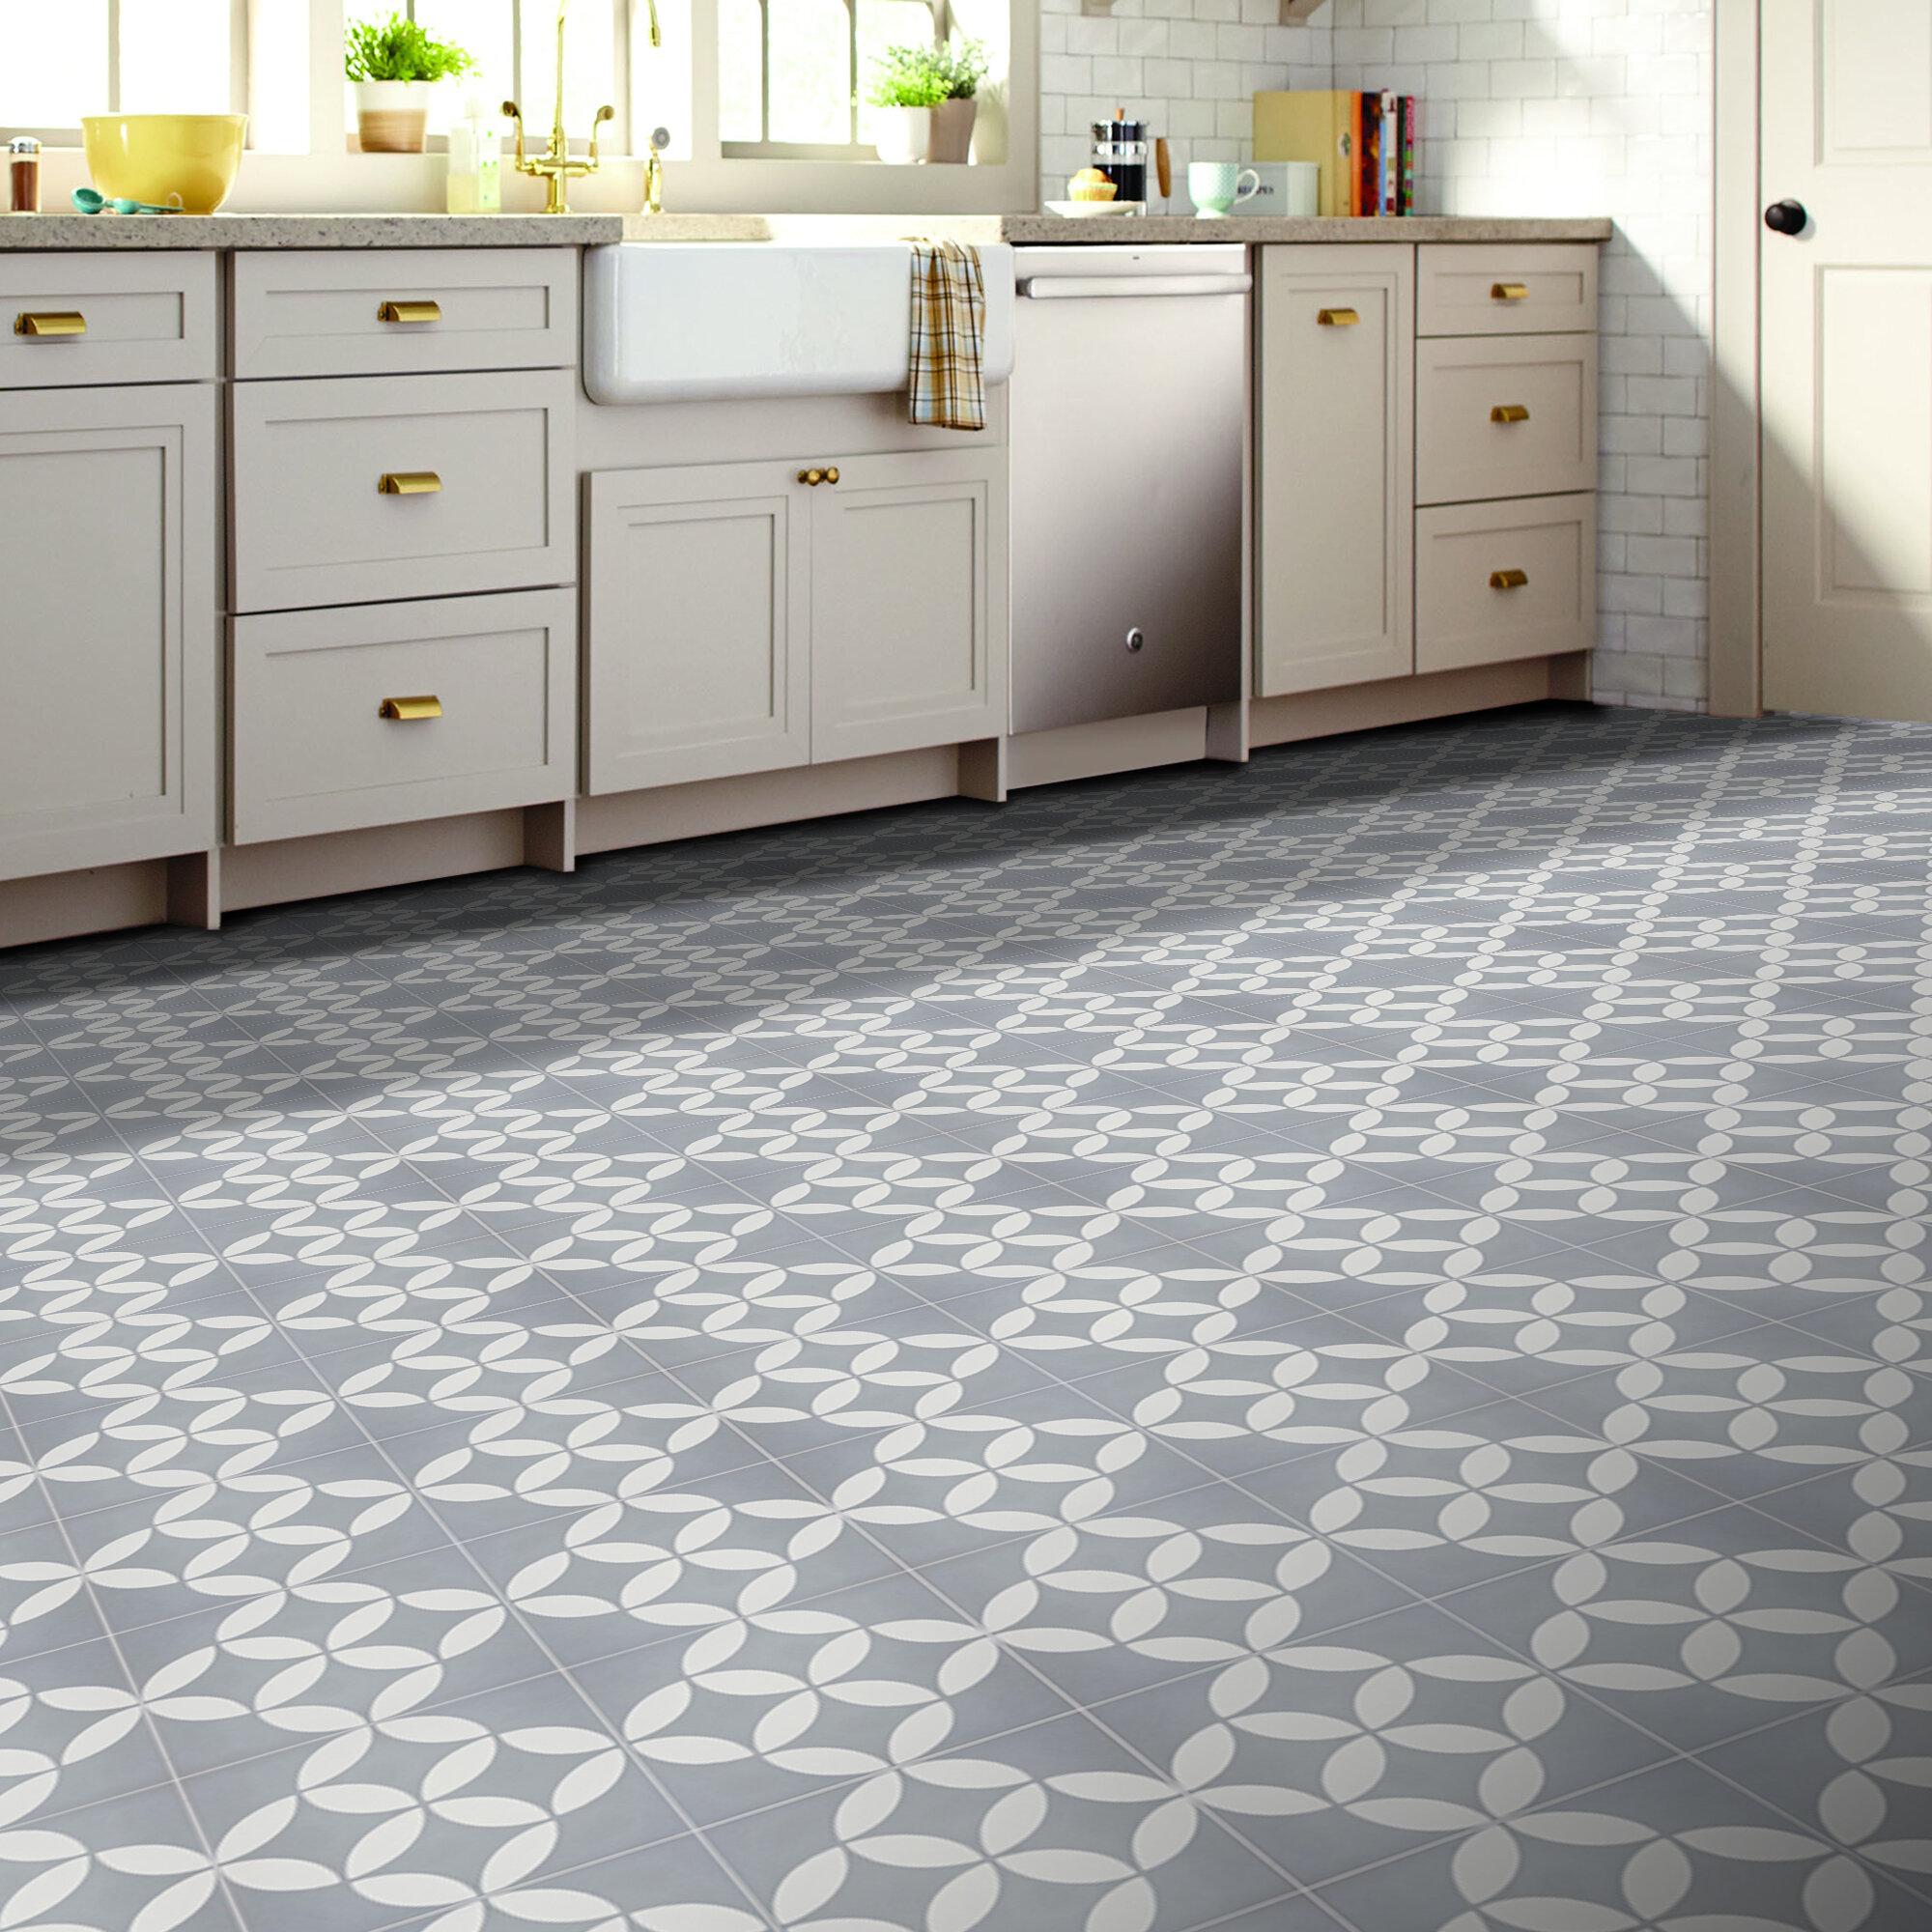 Moroccan Mosaic Tile House Amlo Handmade 8 X 8 Cement Field Tile Wayfair